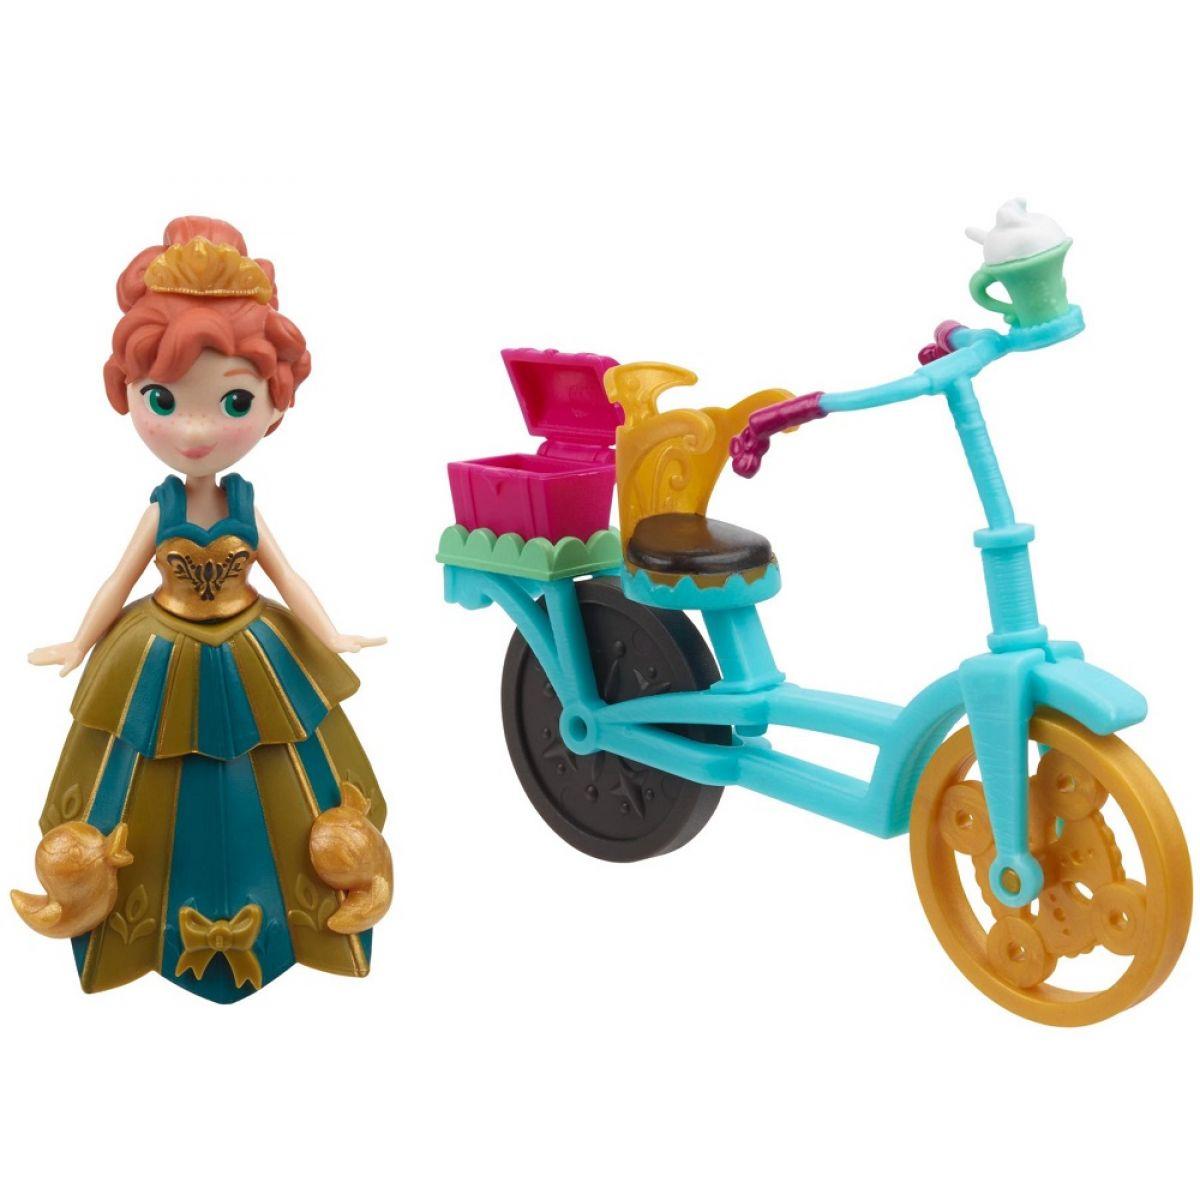 Hasbro Disney Frozen Little Kingdom Mini panenka s doplňky Anna & Bicycle